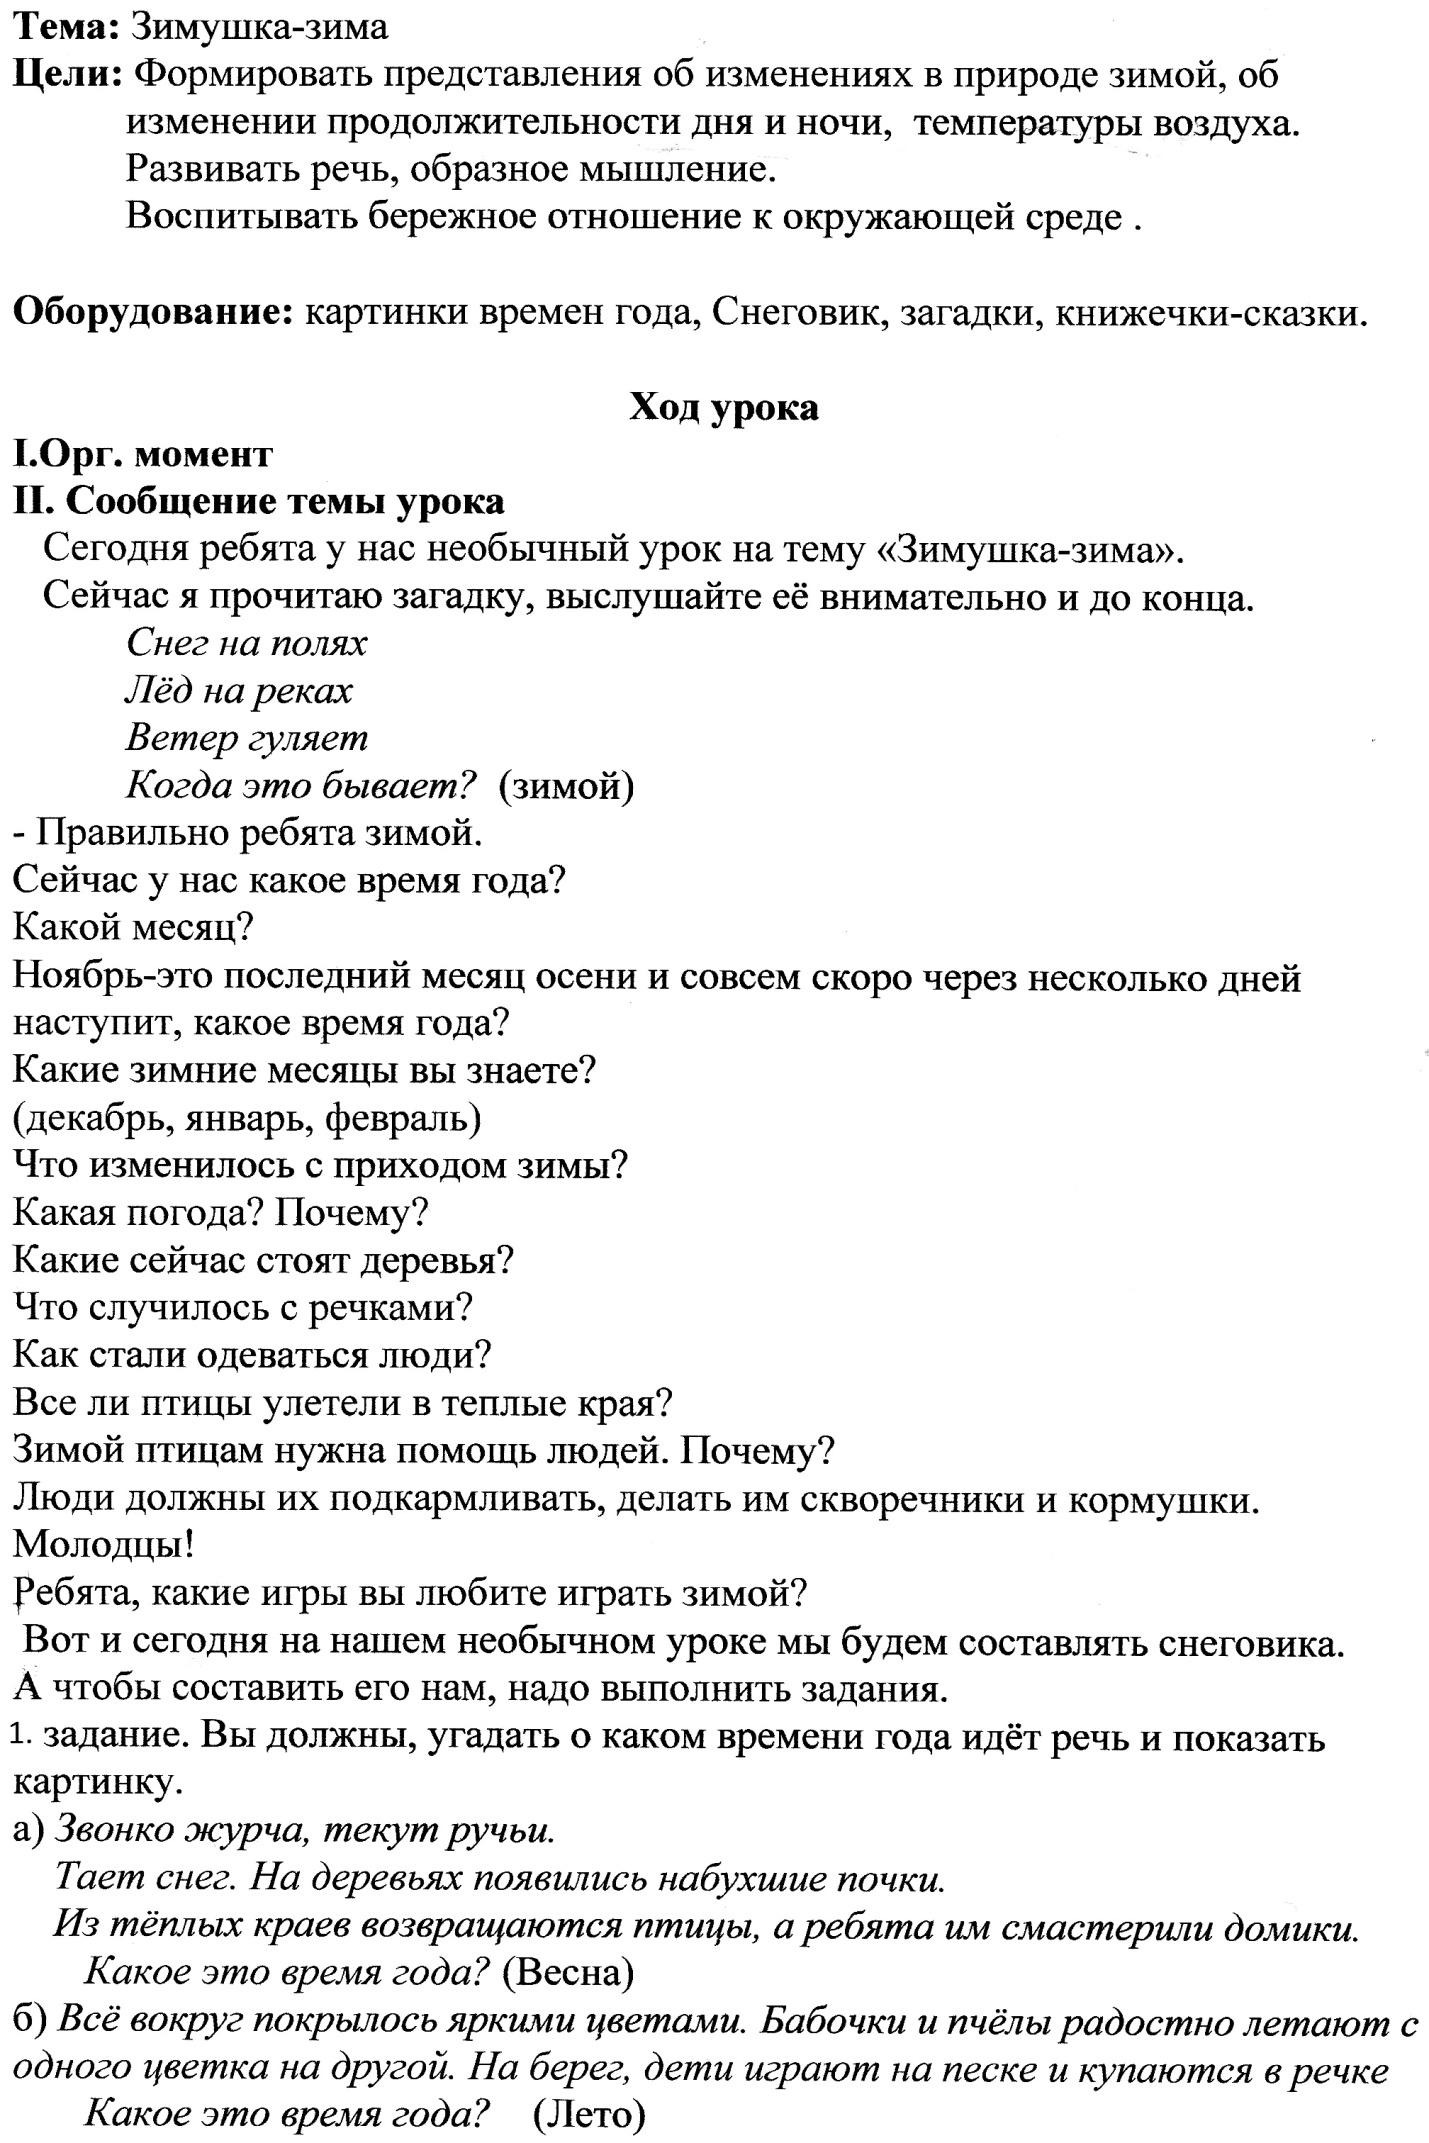 C:\Users\Жирафчик\AppData\Local\Microsoft\Windows\Temporary Internet Files\Content.Word\img051.jpg